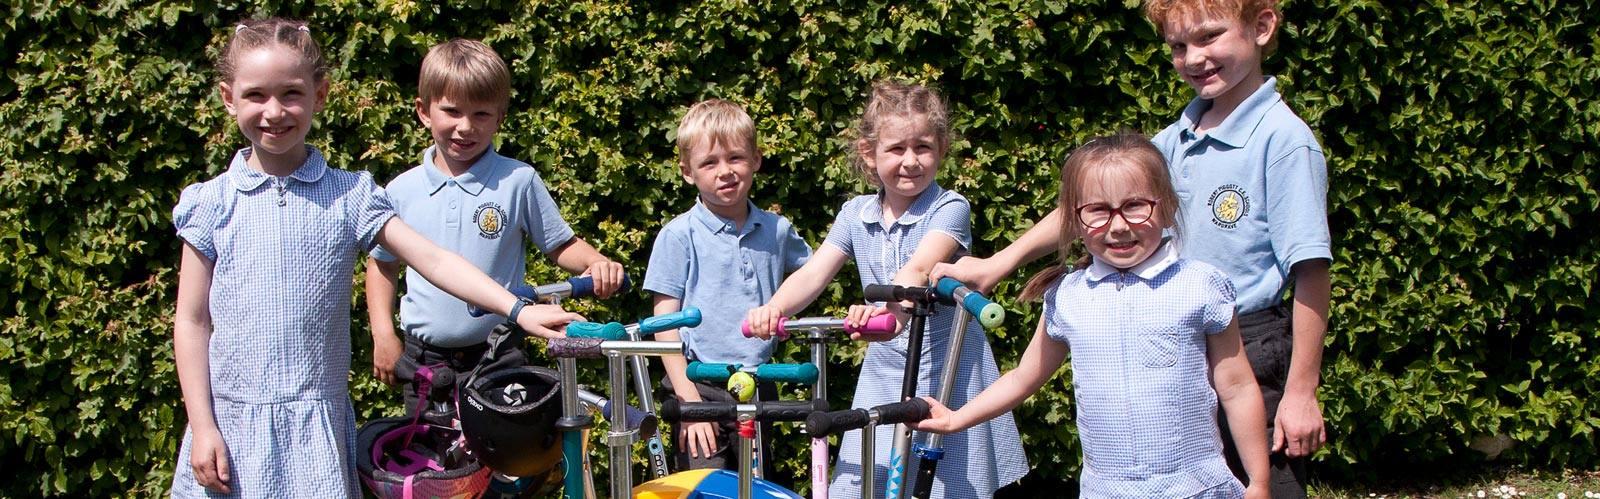 The Robert Piggott C of E School reap the benefits of Recycling!